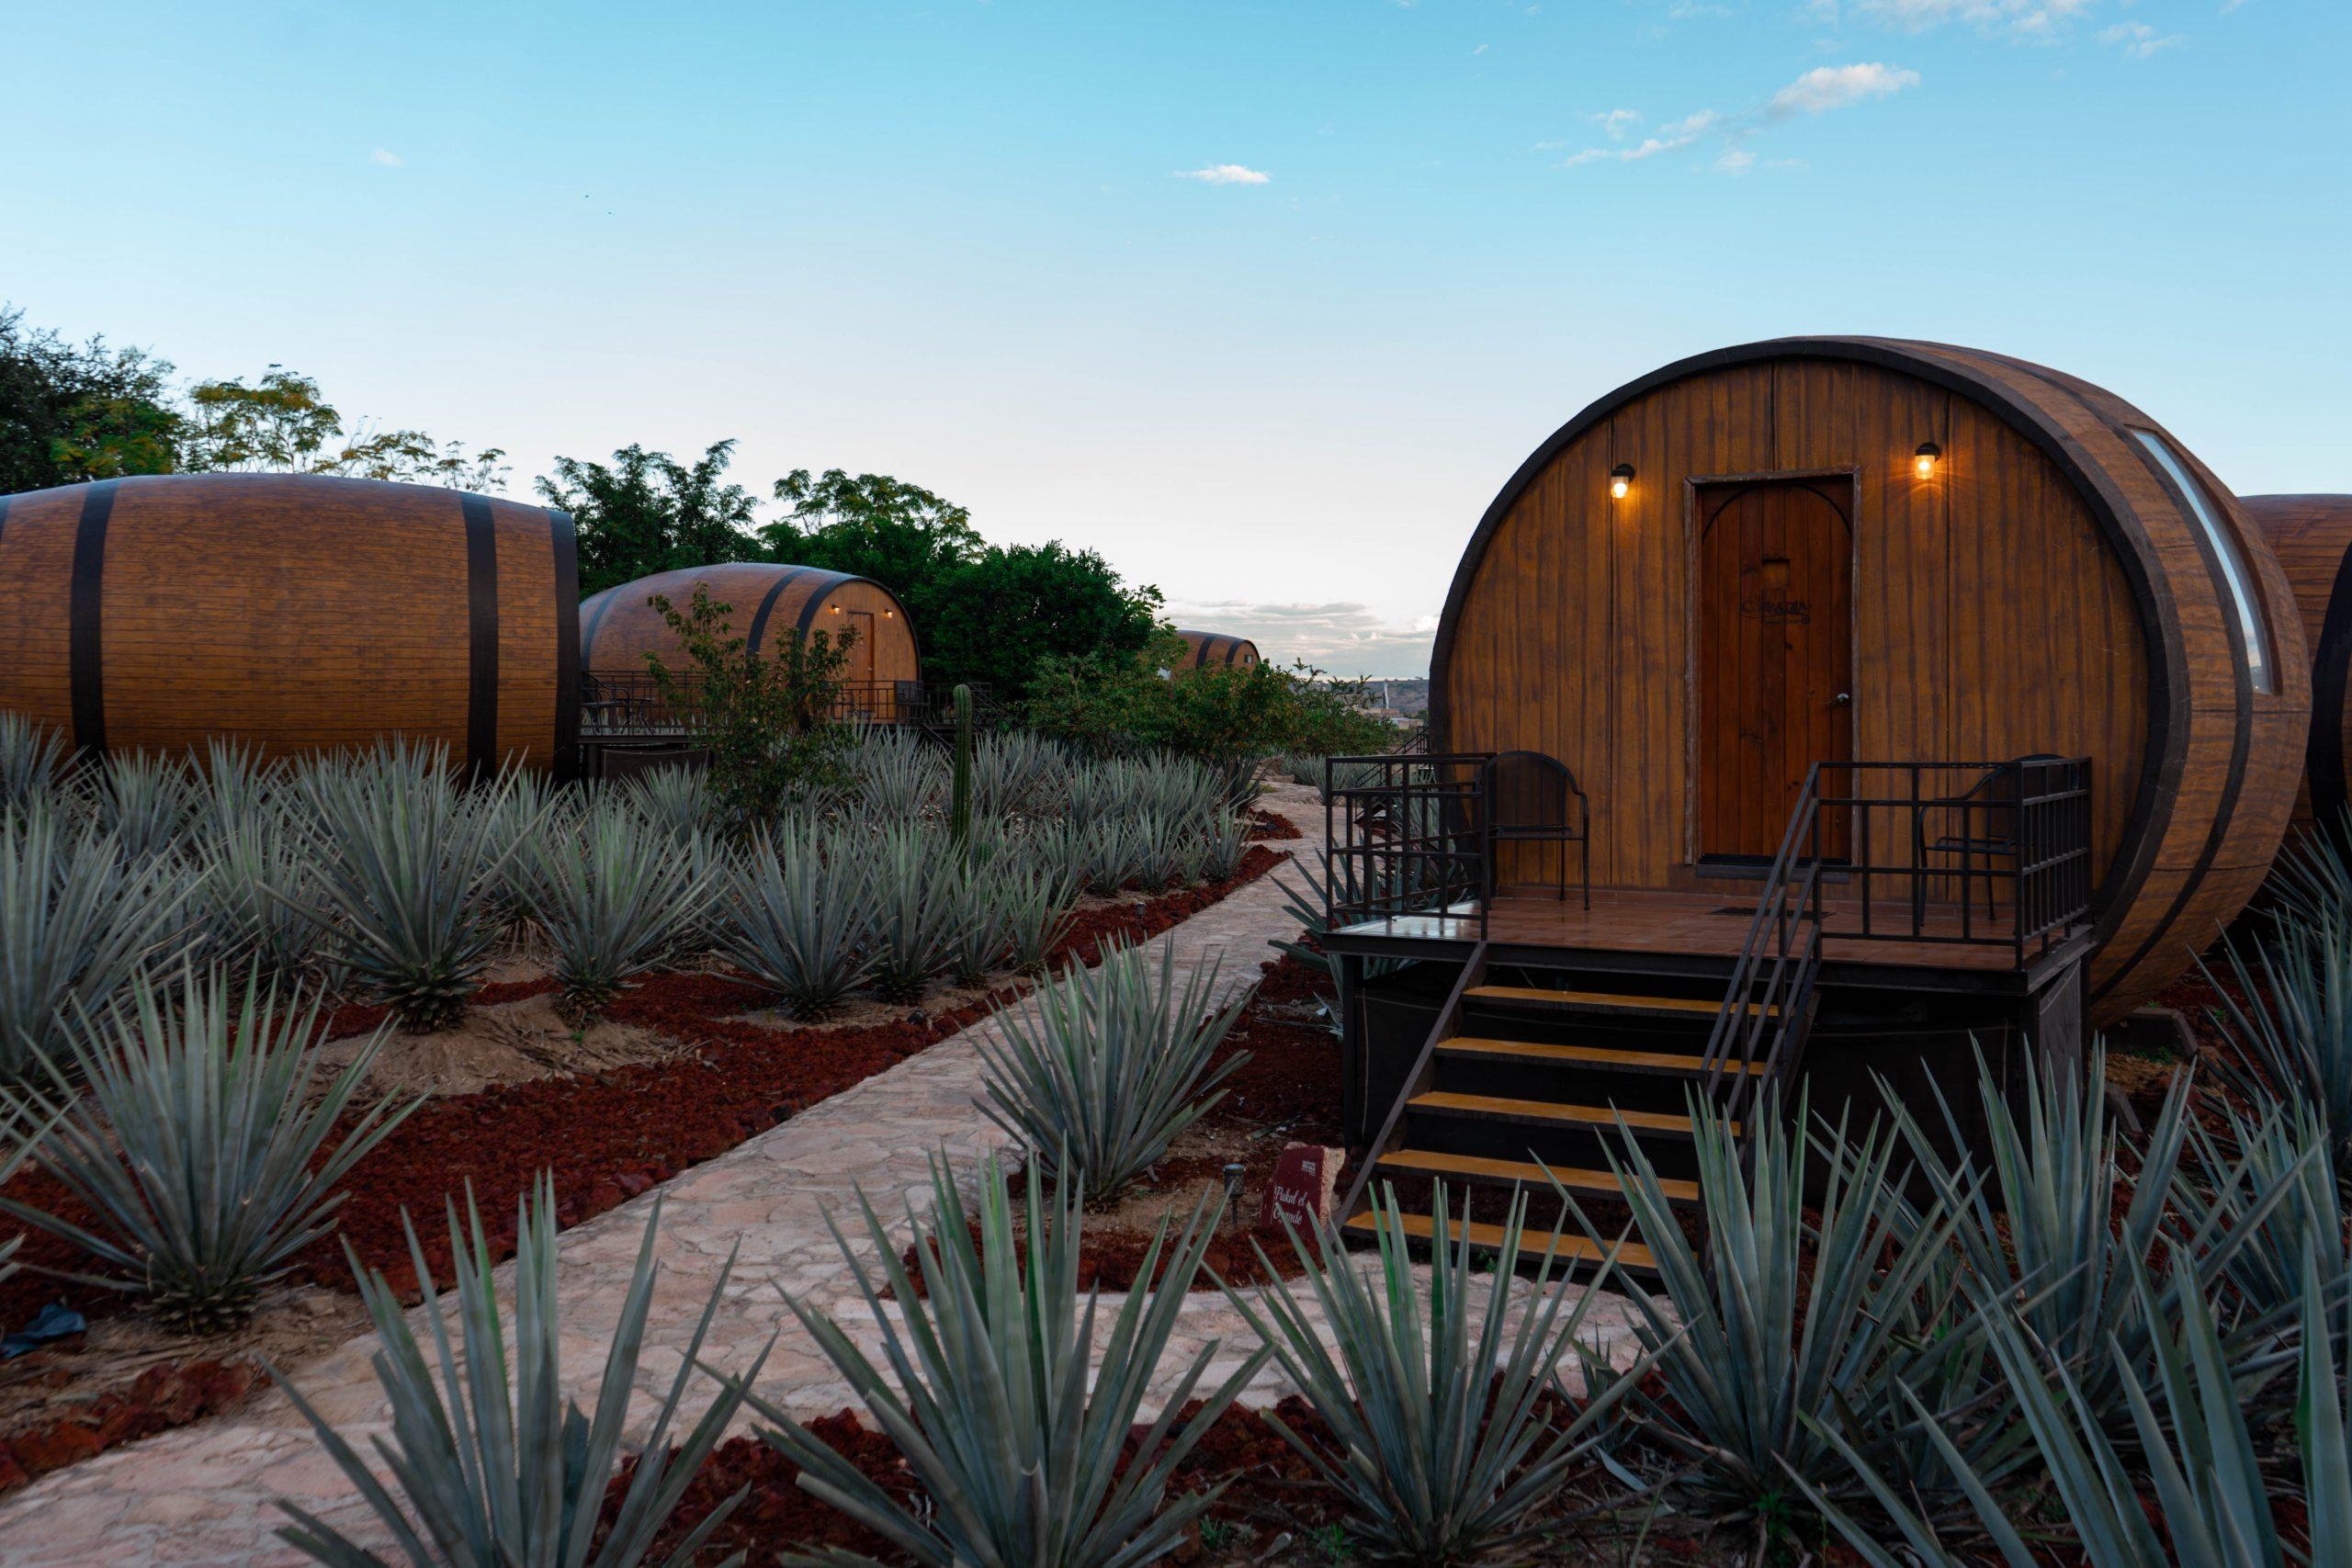 matices hotel de barricas tequila hotel barrel rooms jalisco mexico